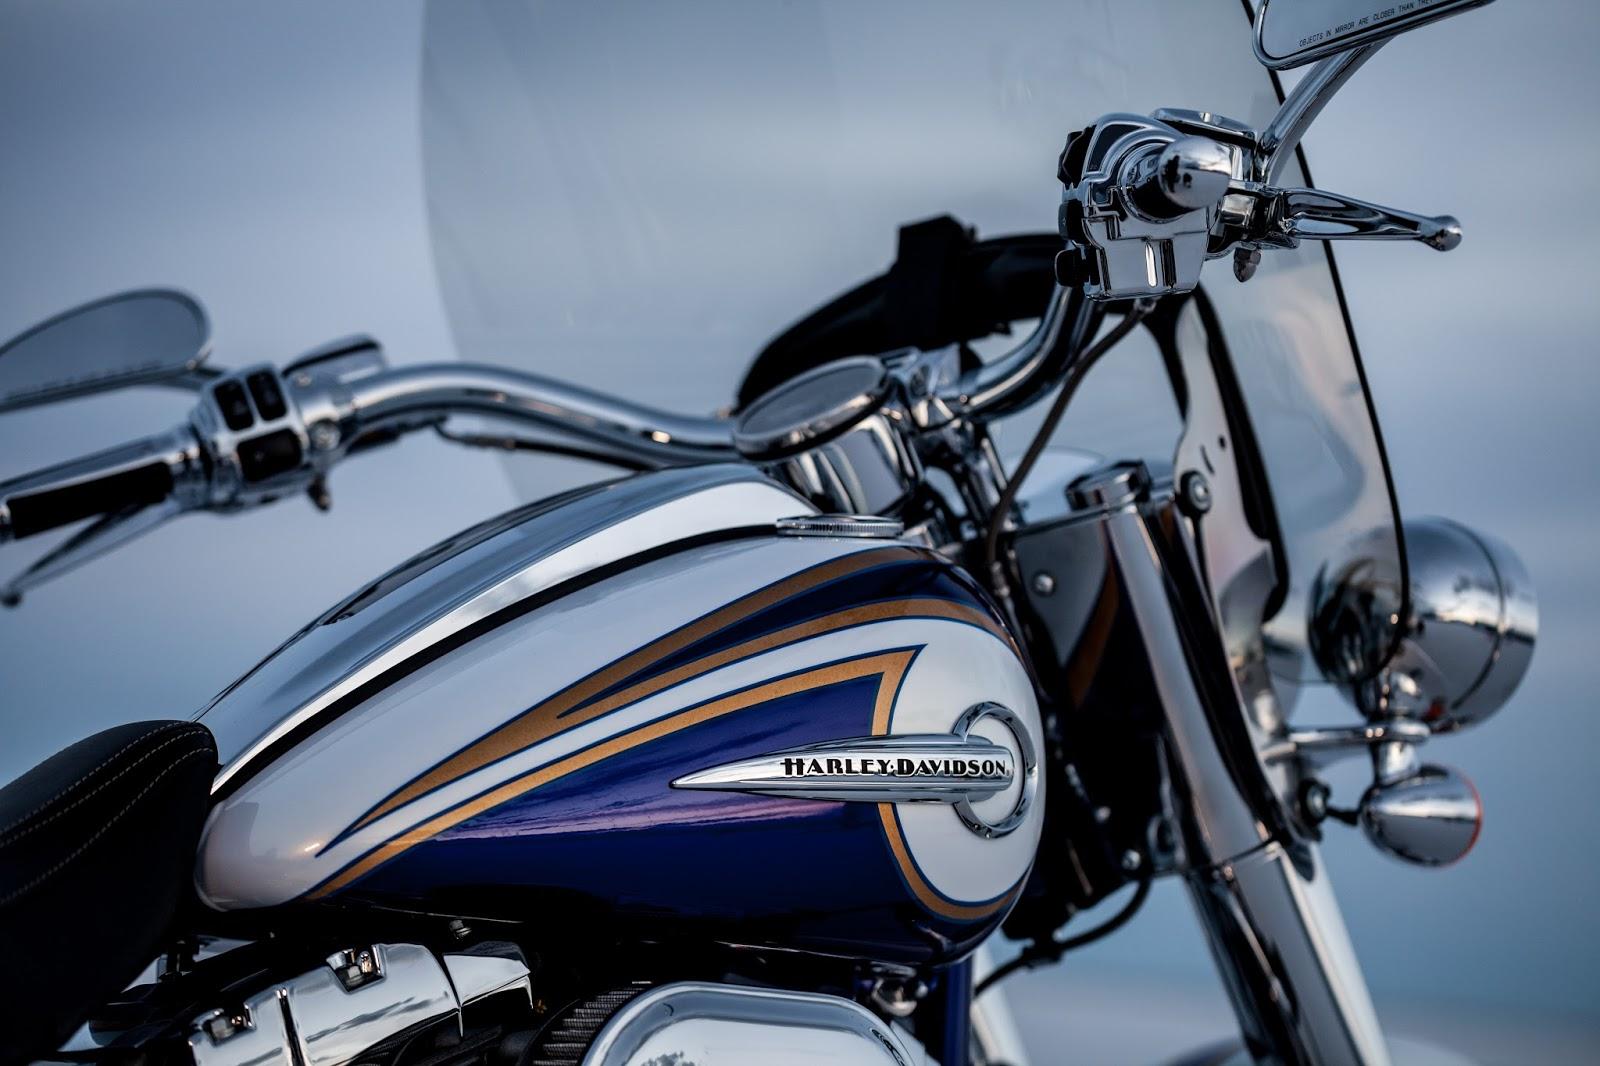 Harley-Davidson 2014 CVO Softail Deluxe